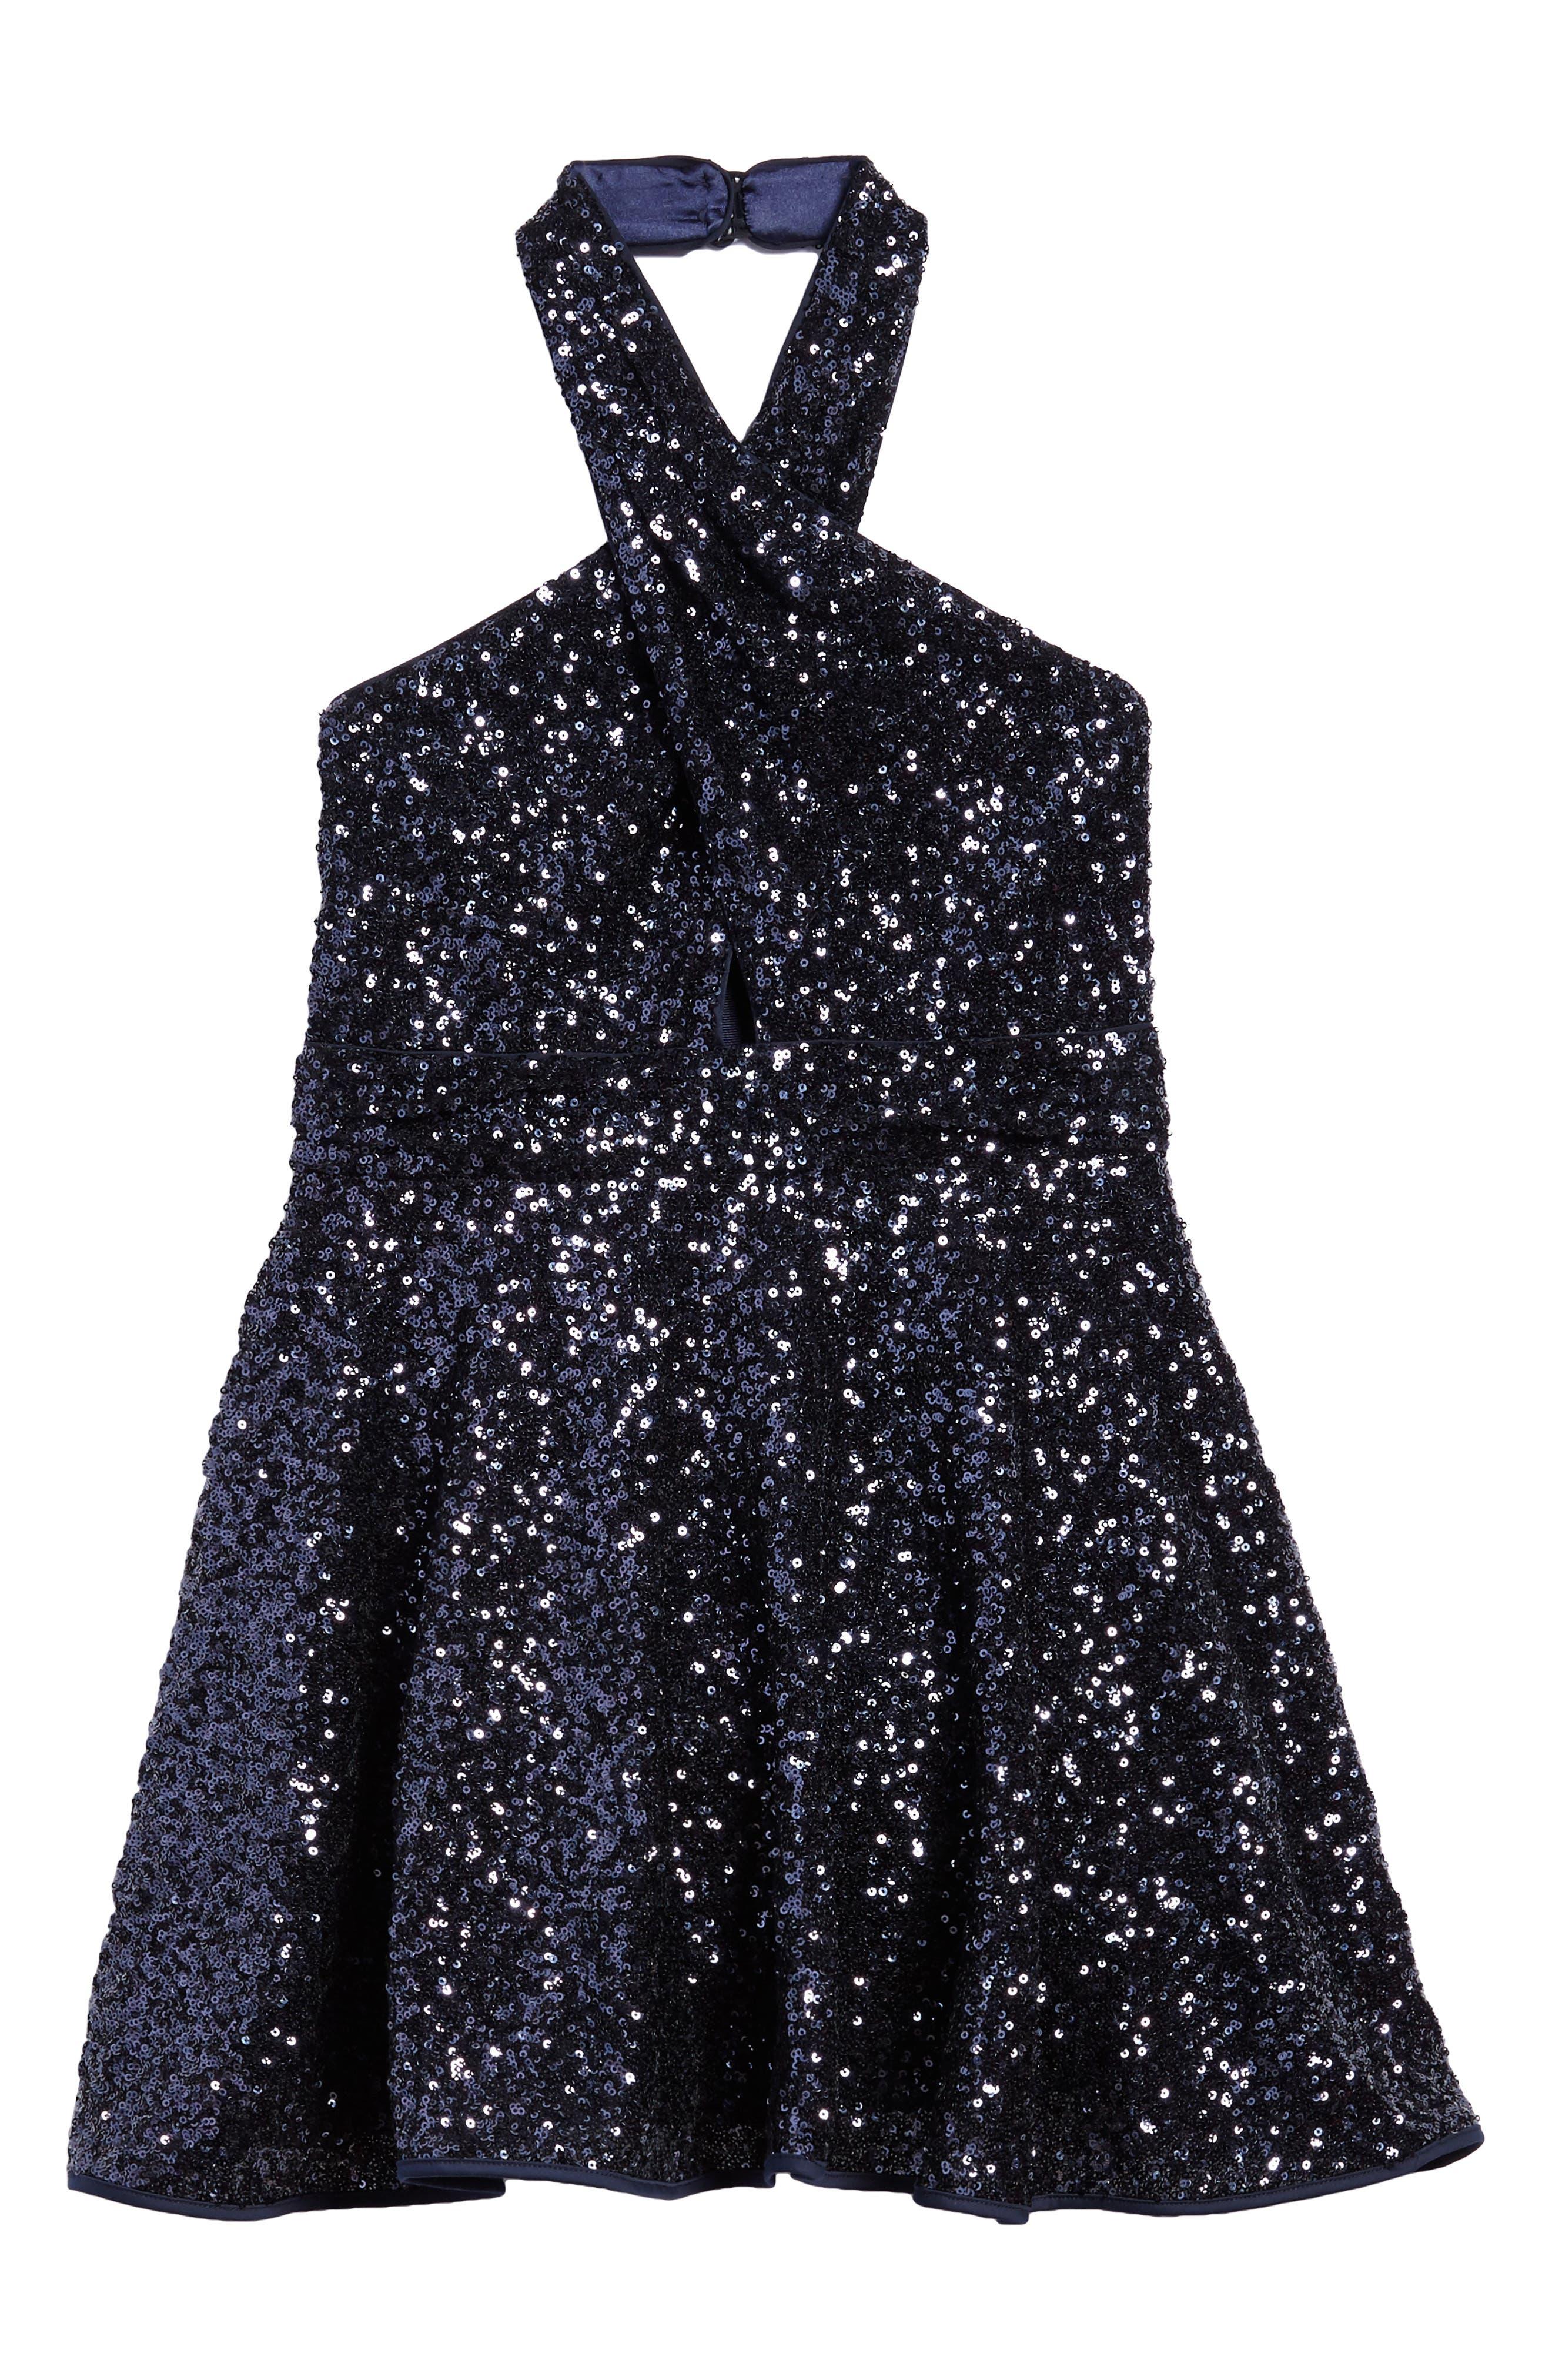 Main Image - Milly Minis Sydney Sequin Halter Dress (Big Girls)